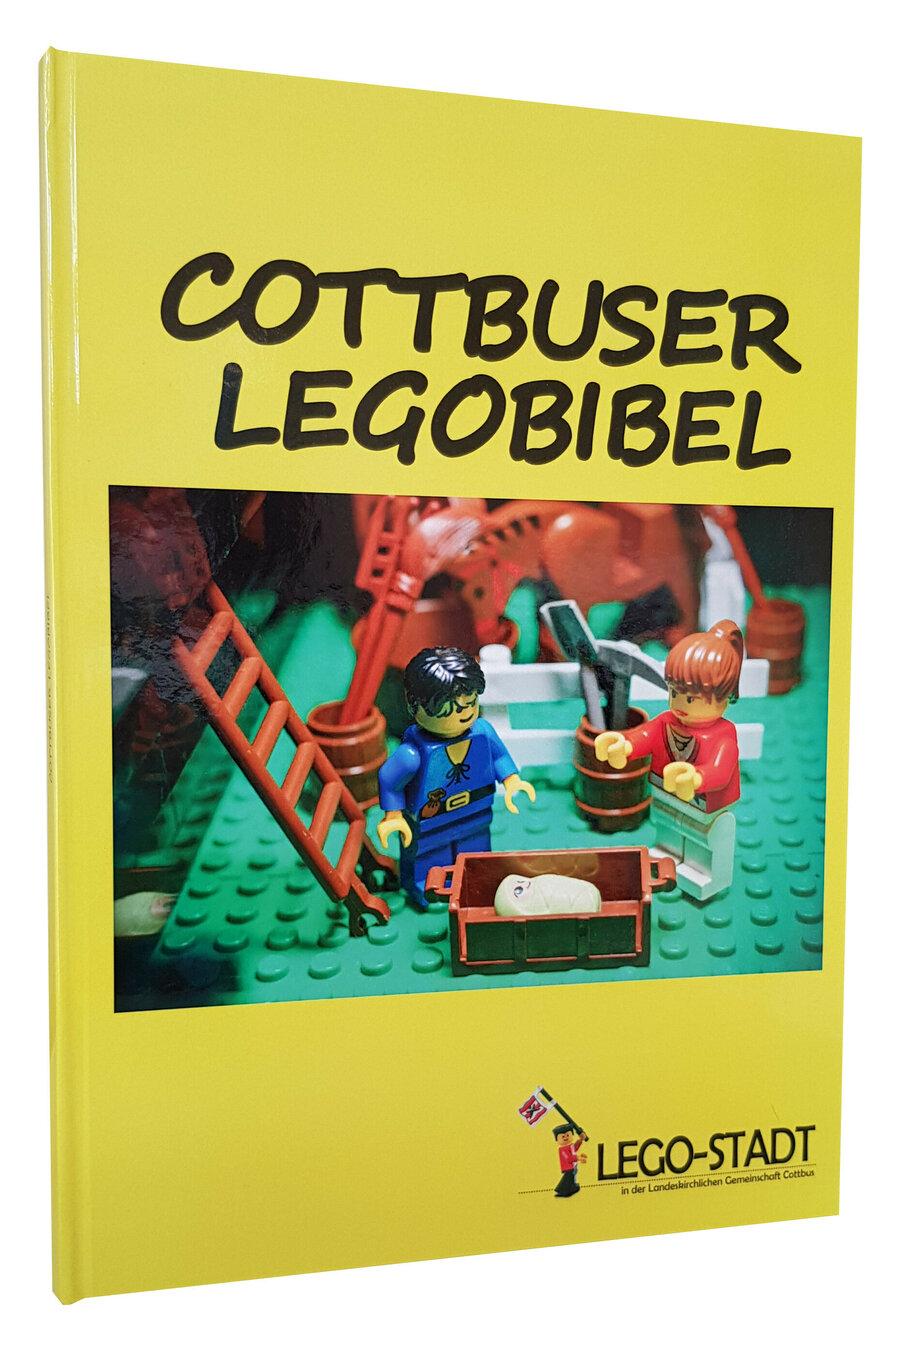 Cottbuser Legobibel